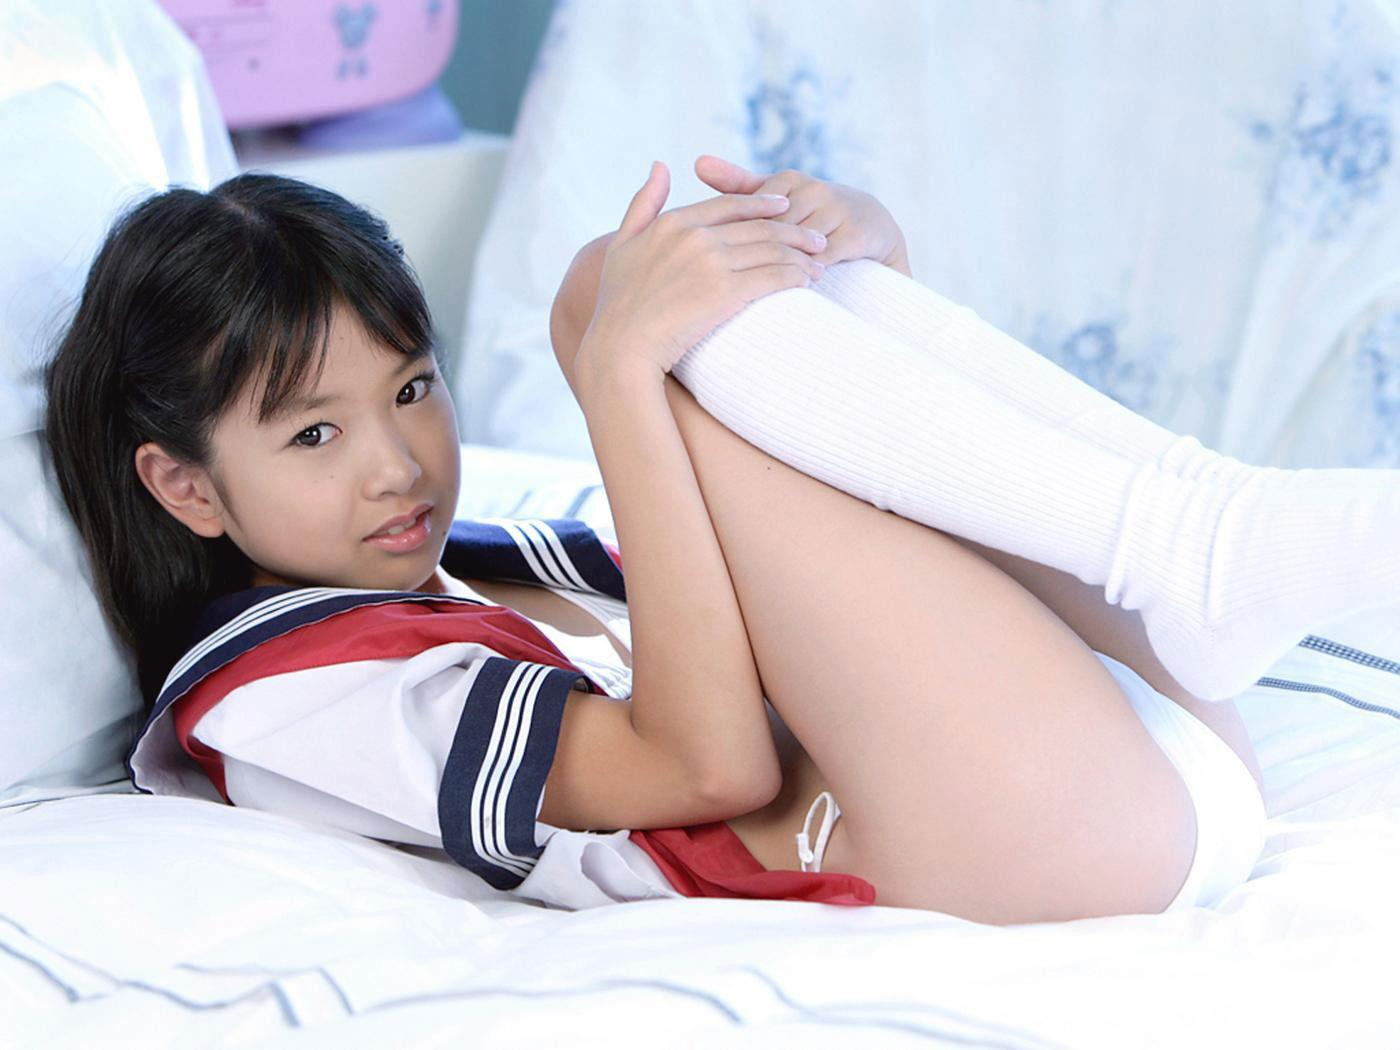 young idol blog nude pics